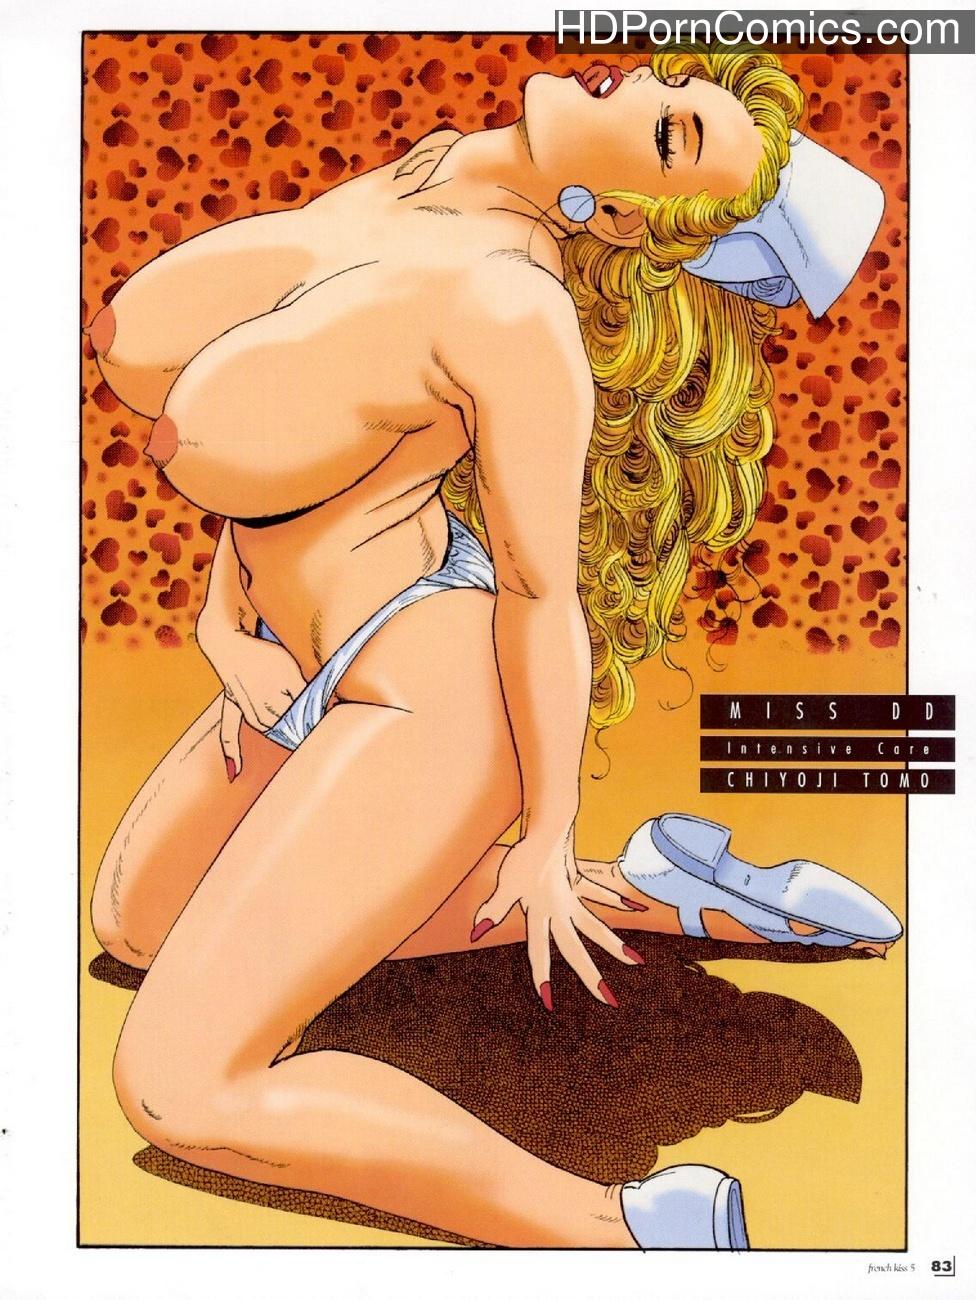 Erotic comic